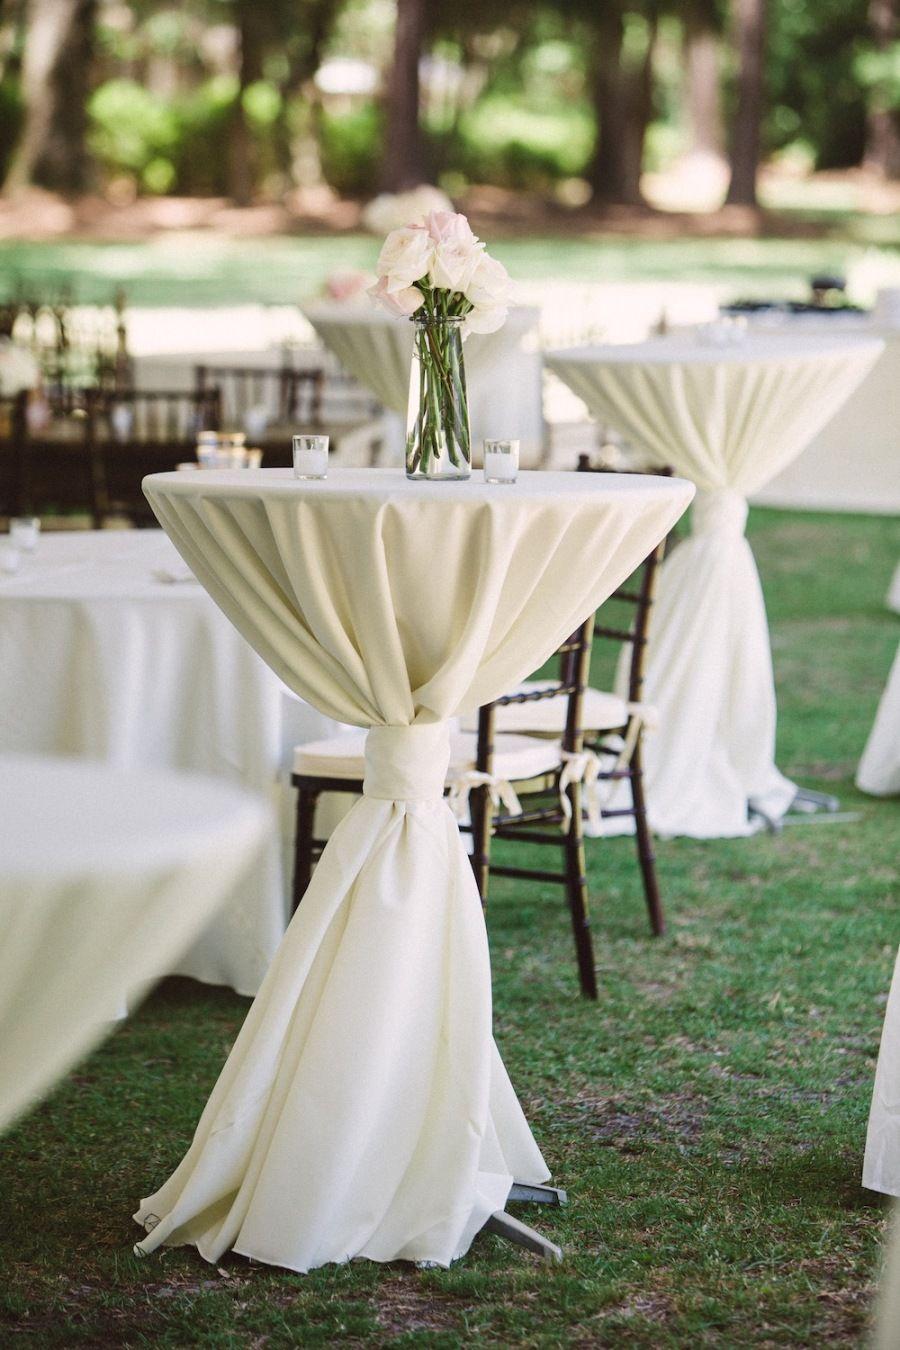 Rent tables in Kenya